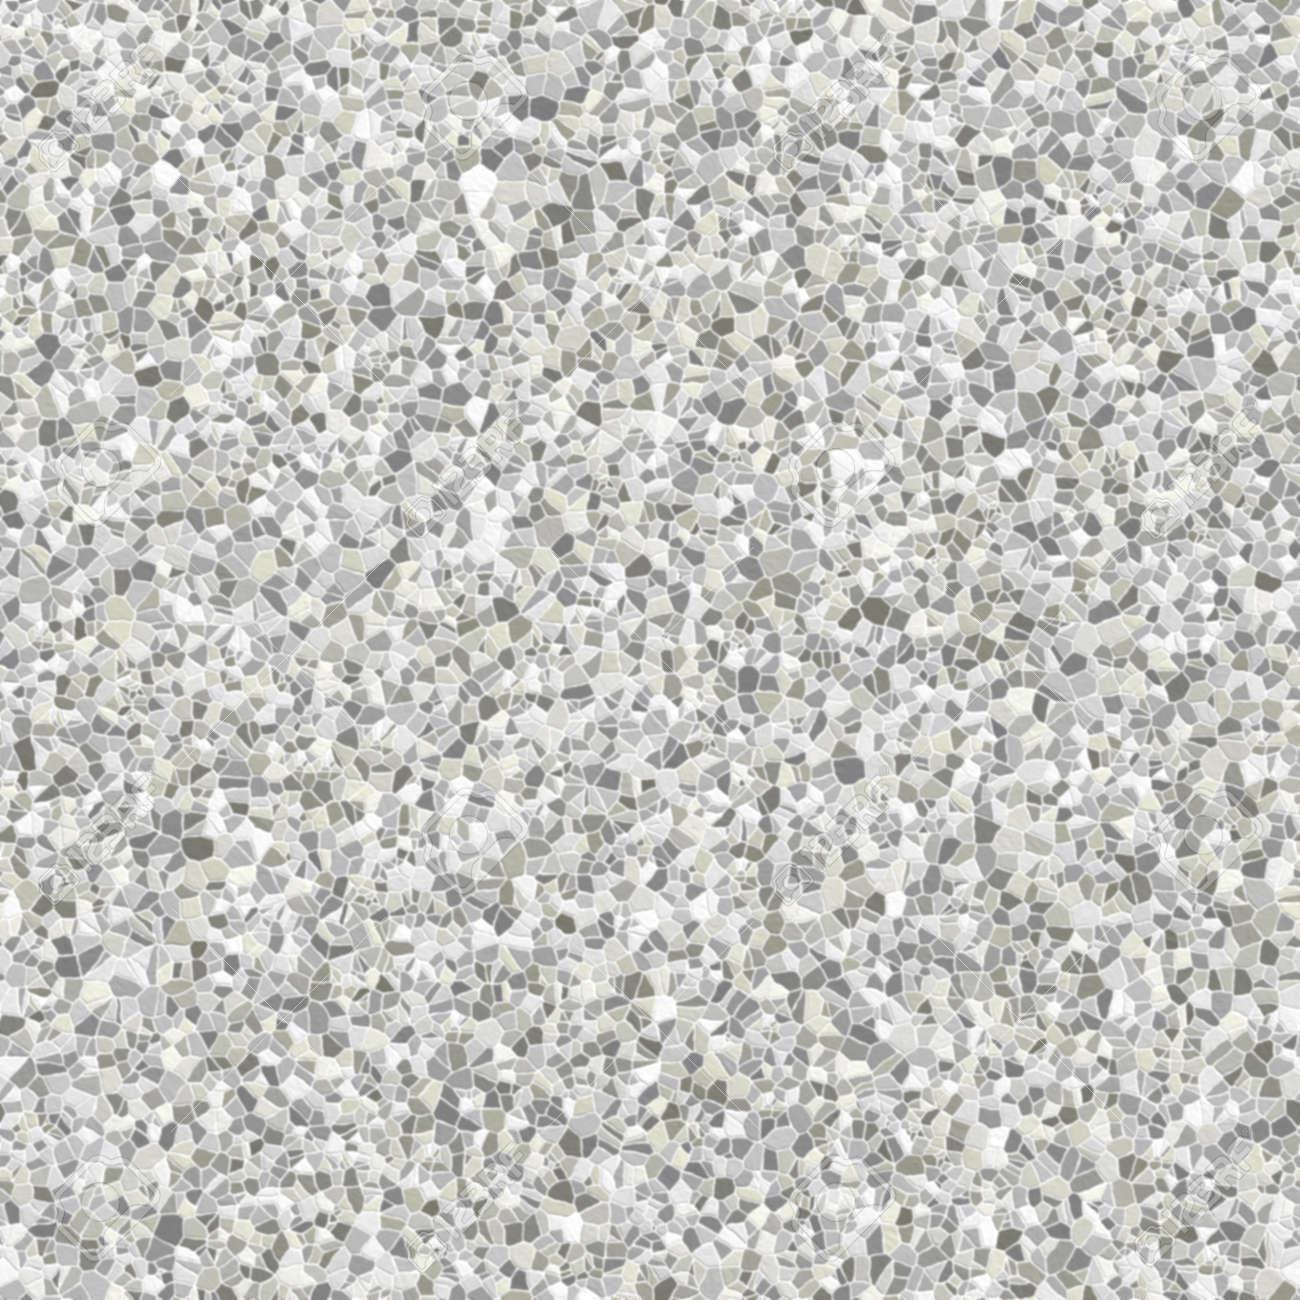 Terrazzo Floor: Terrazzo Floor Seamless Texture Tile Stock Photo